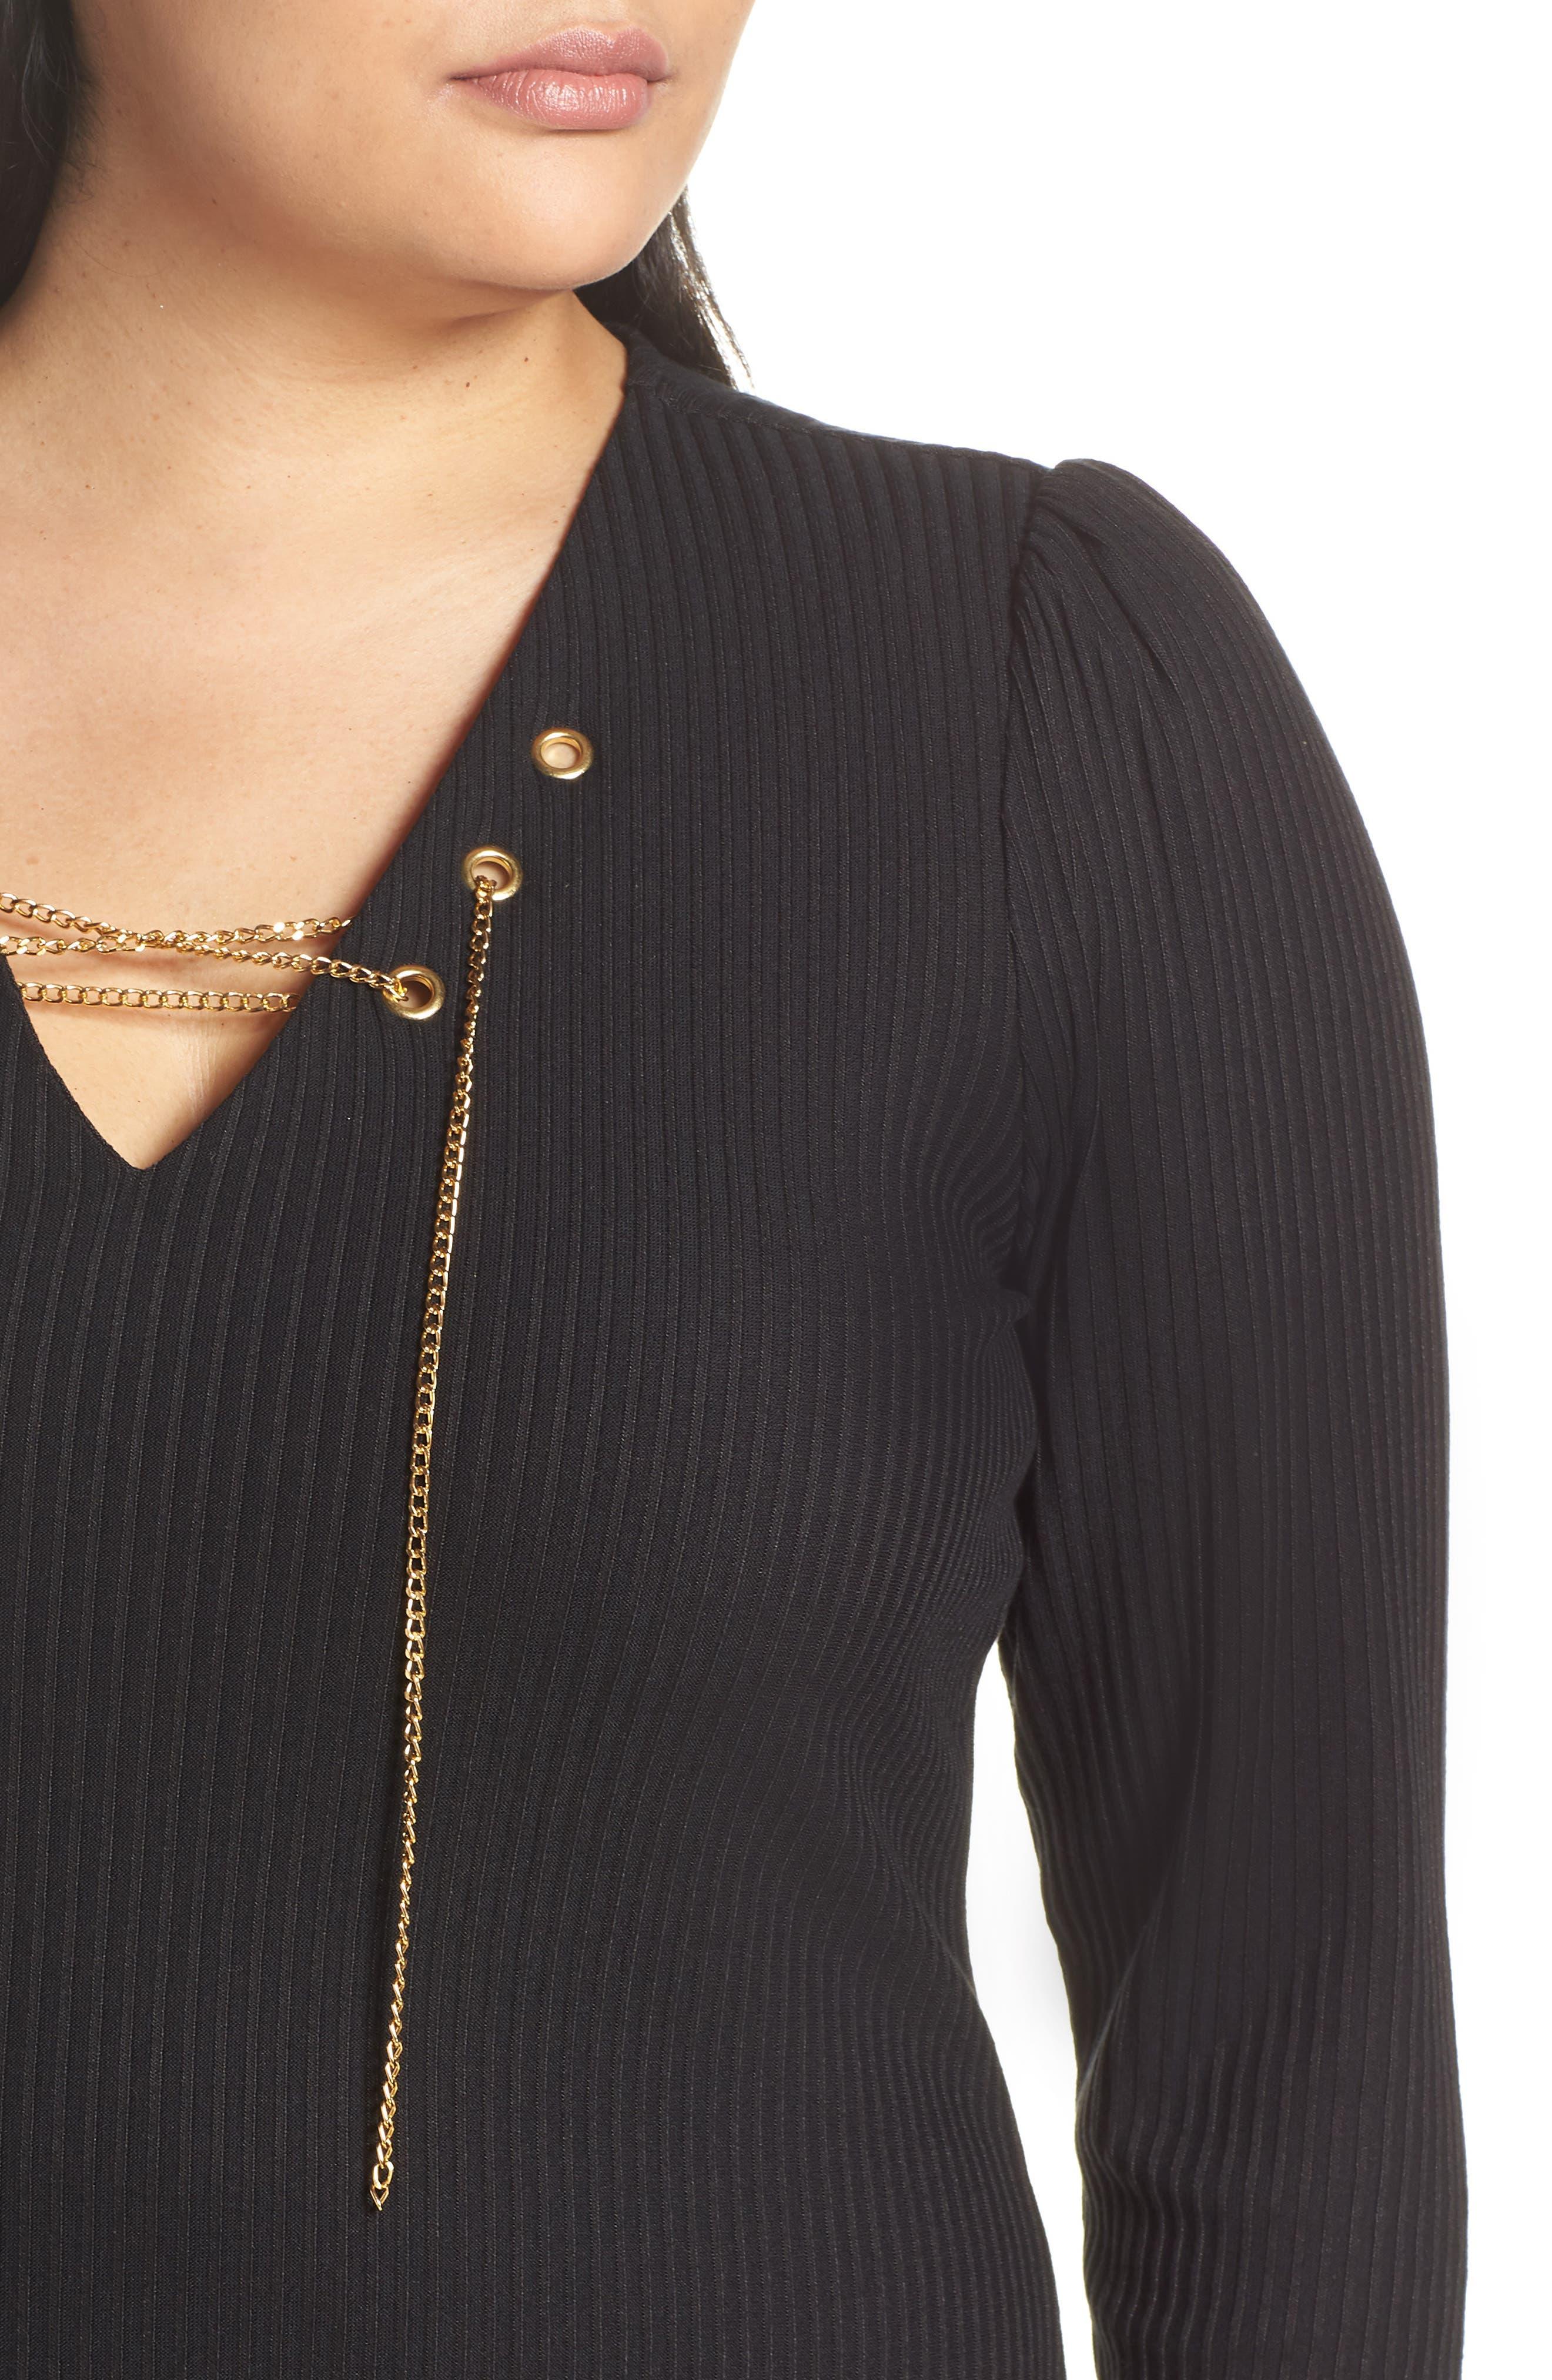 MICHAEL MICHAEL KORS, Chain Lace-Up V-Neck Sweater Dress, Alternate thumbnail 5, color, 001